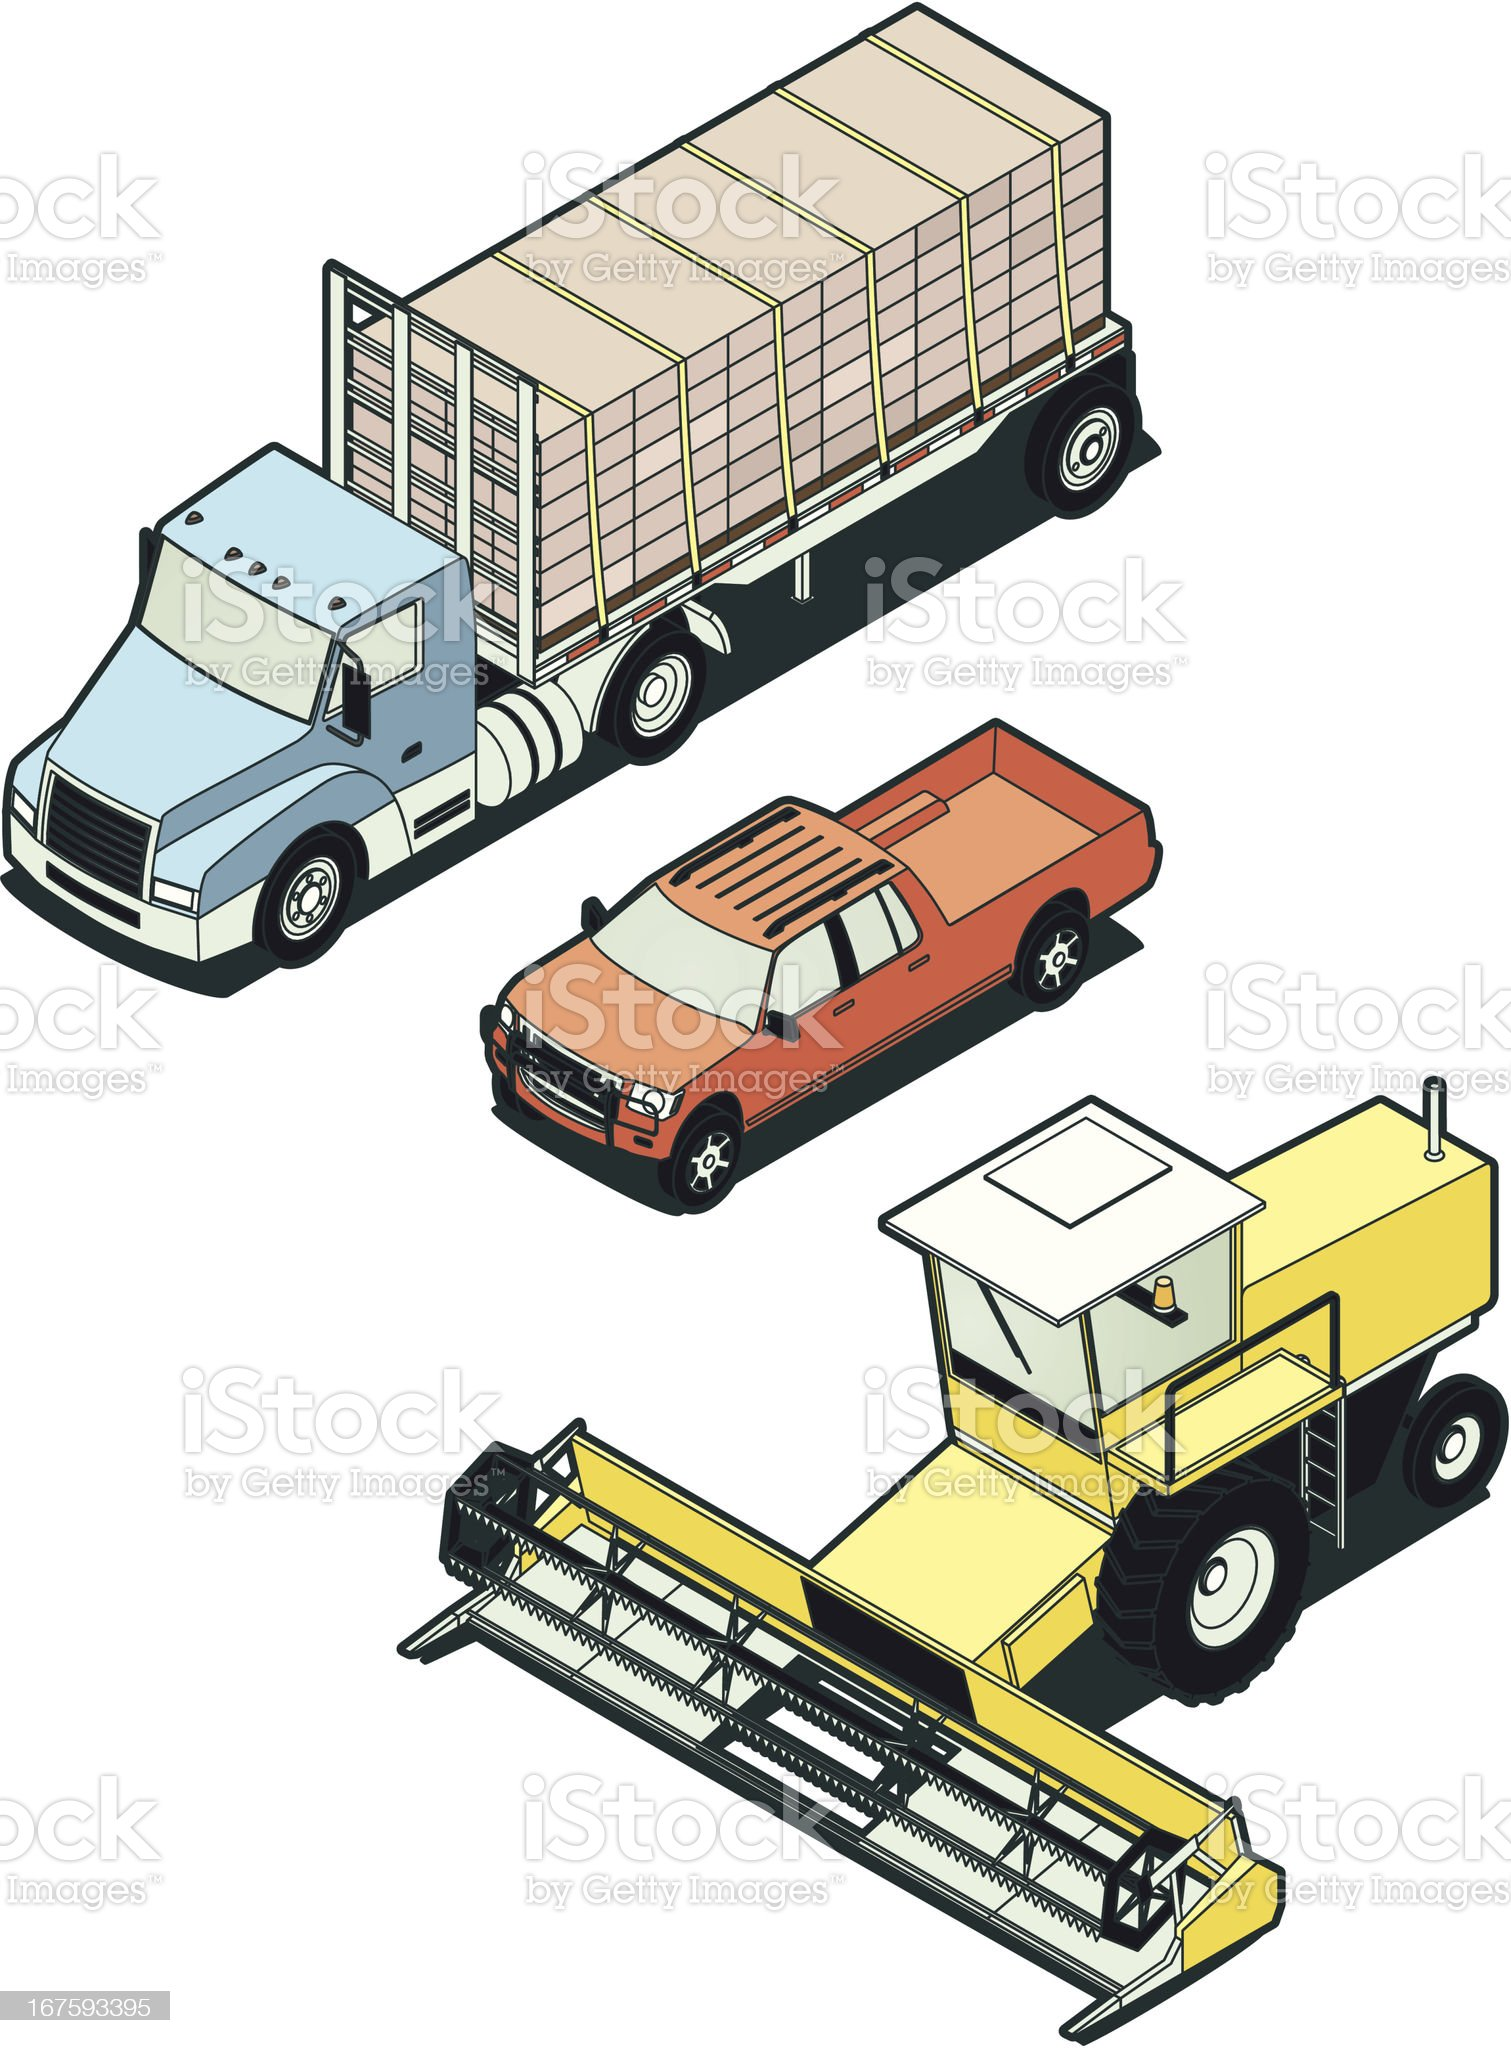 Stock Isometric Farm Vehicles royalty-free stock vector art